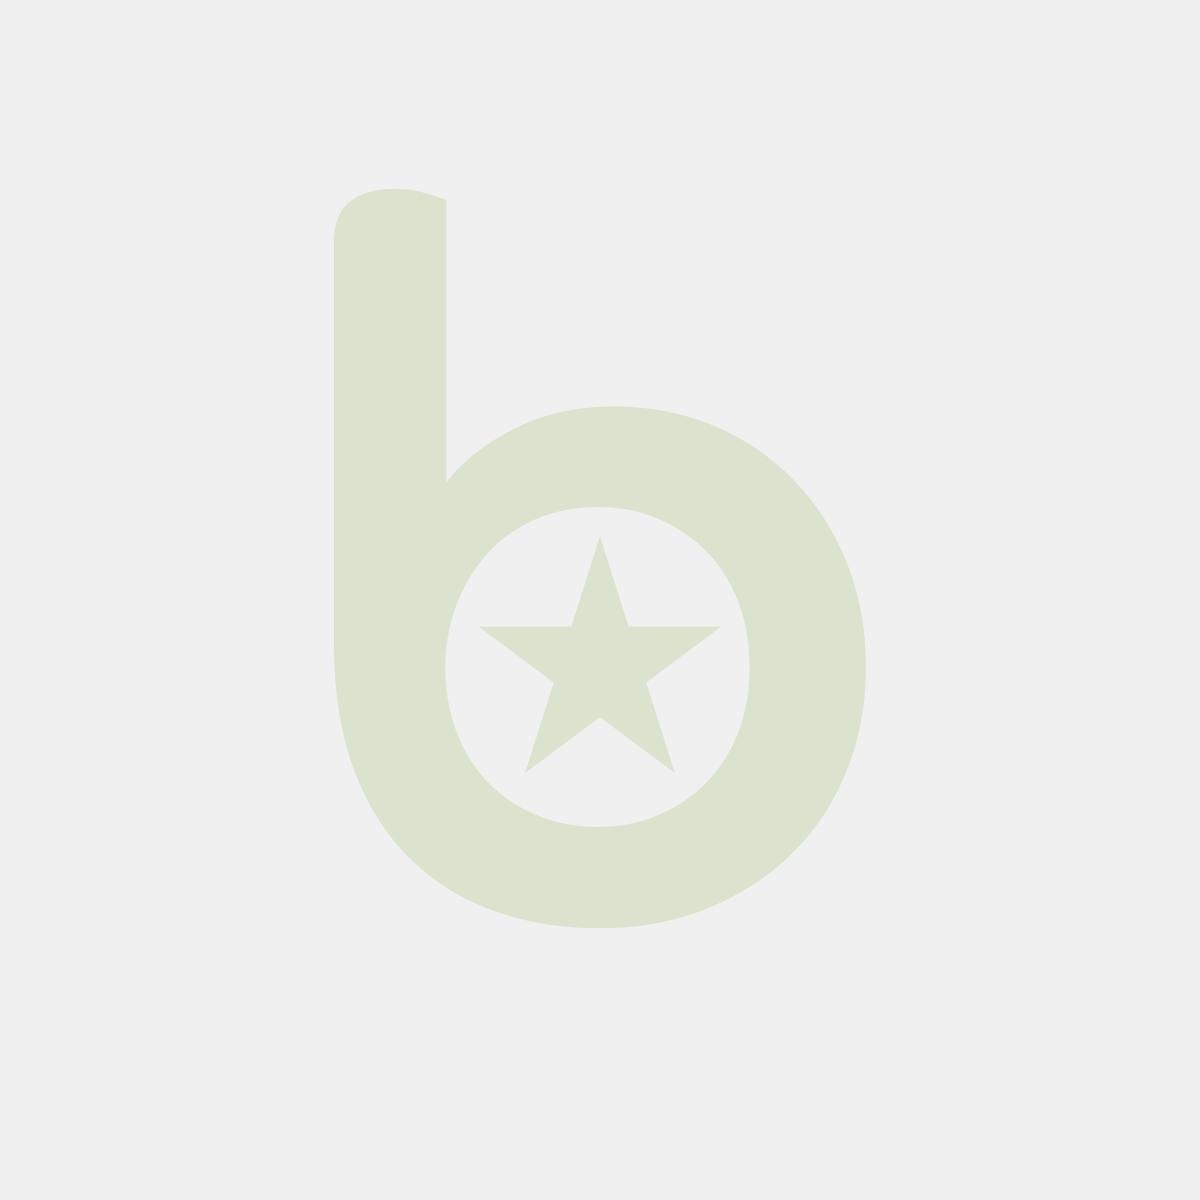 Łopata do PIZZY aluminiowa Orchidea kod 617878